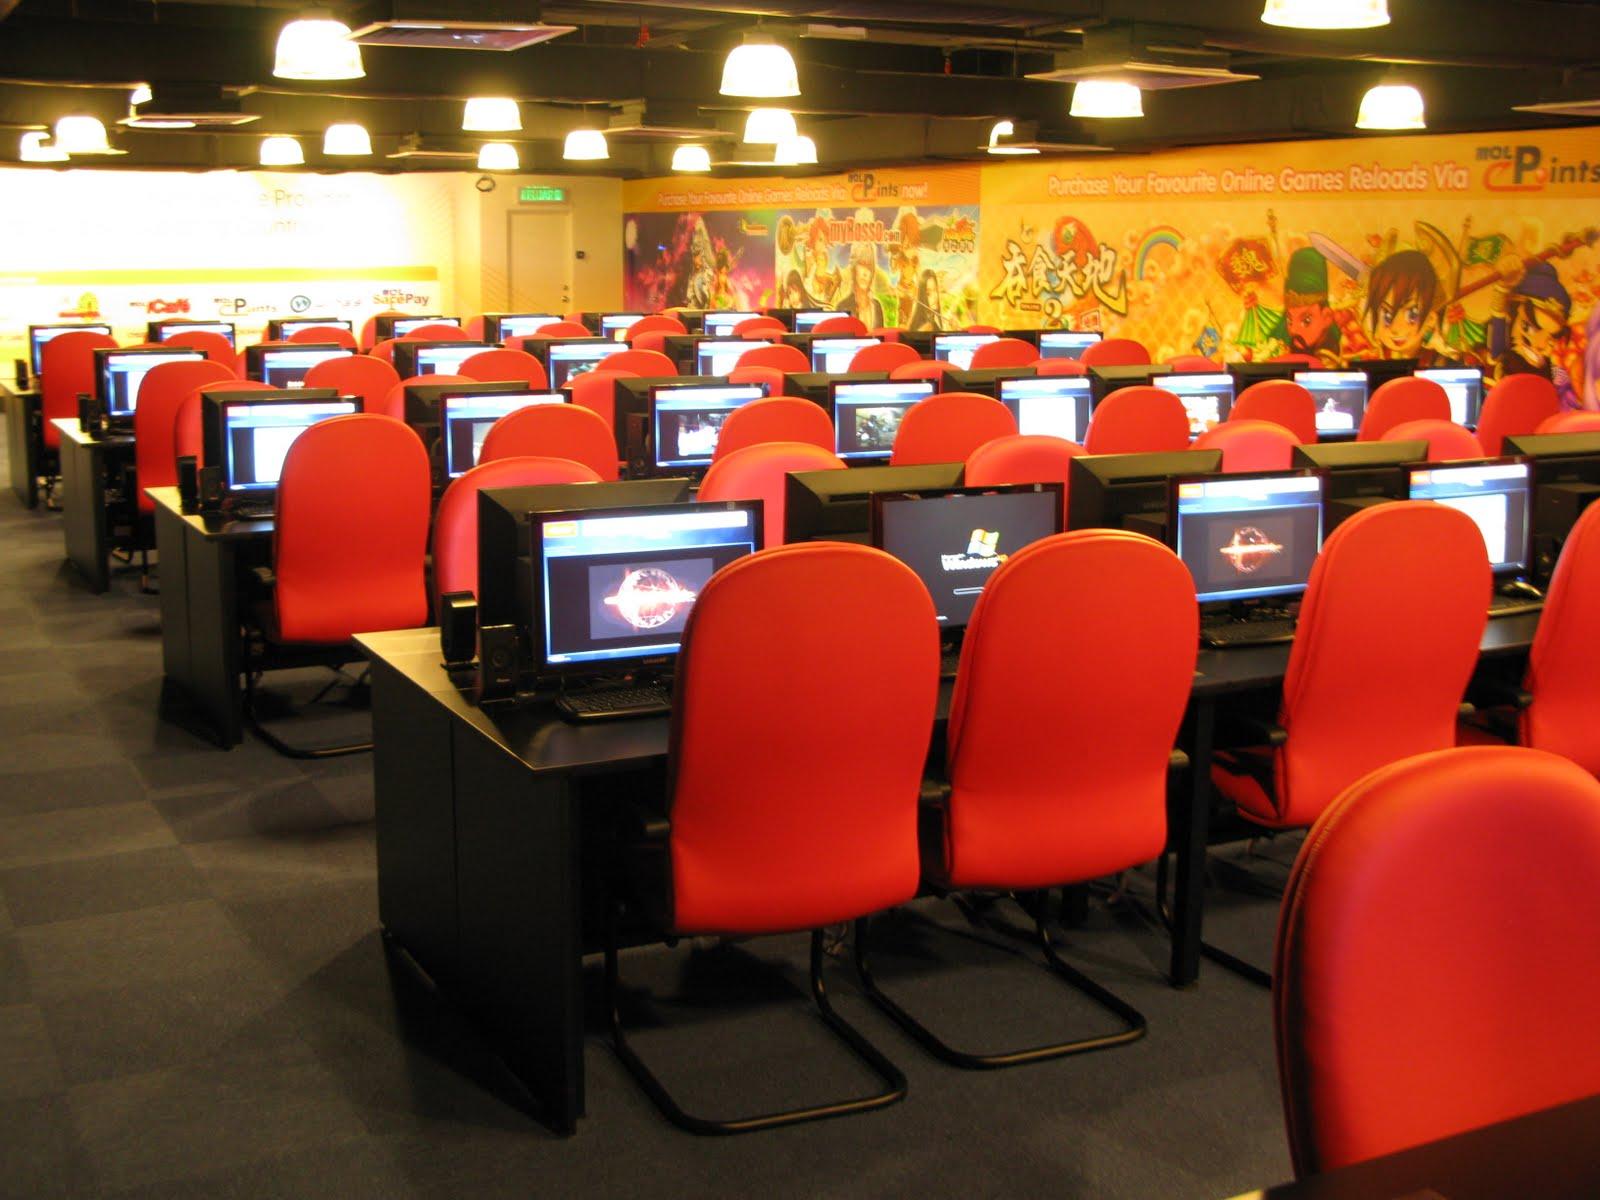 cyber cafe business plan malaysia news